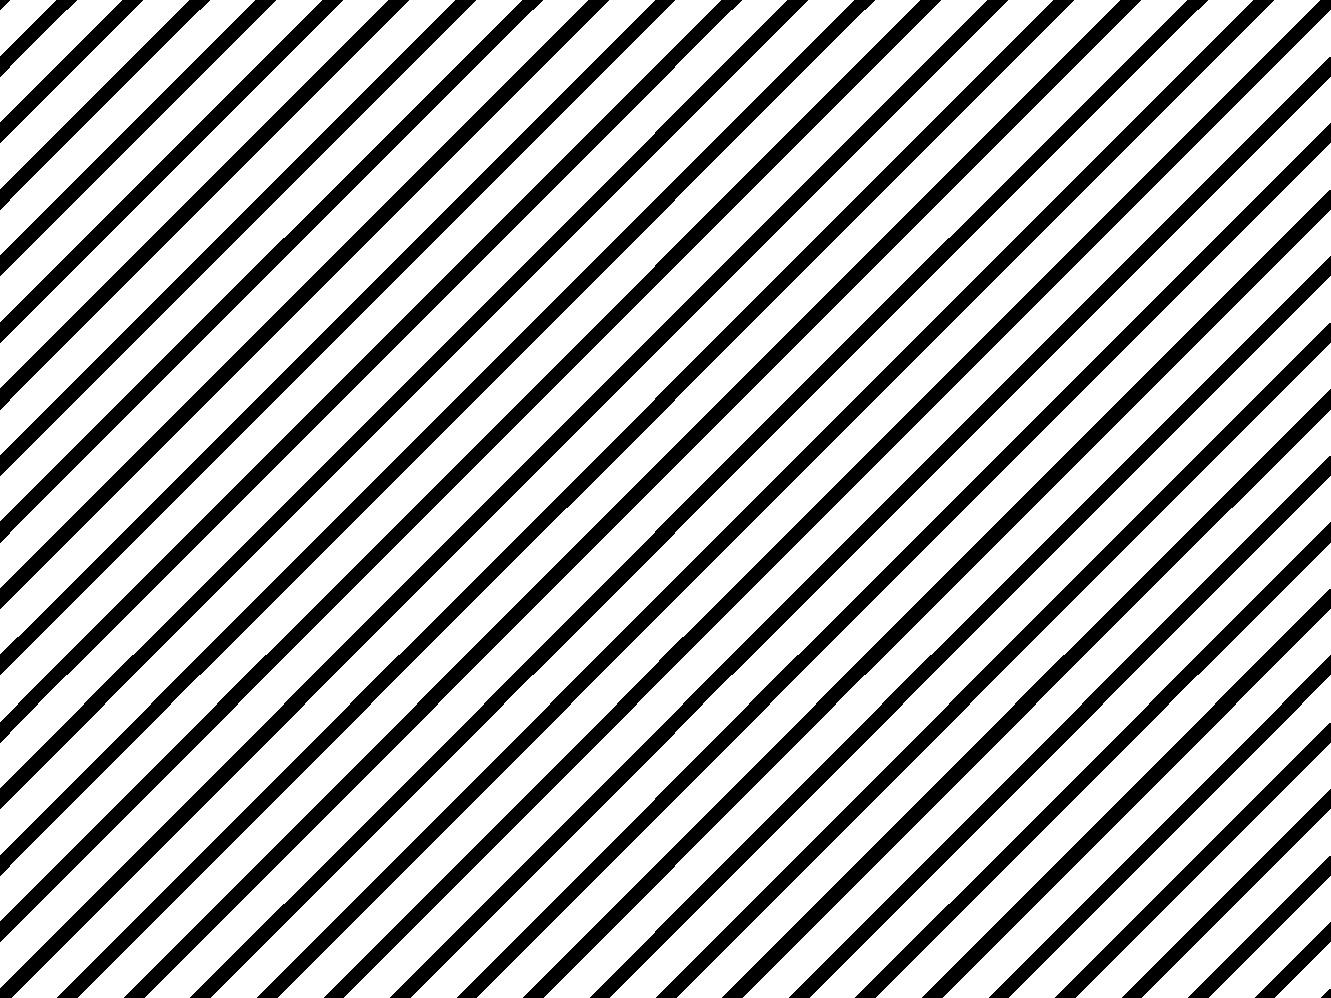 html how to create diagonal line